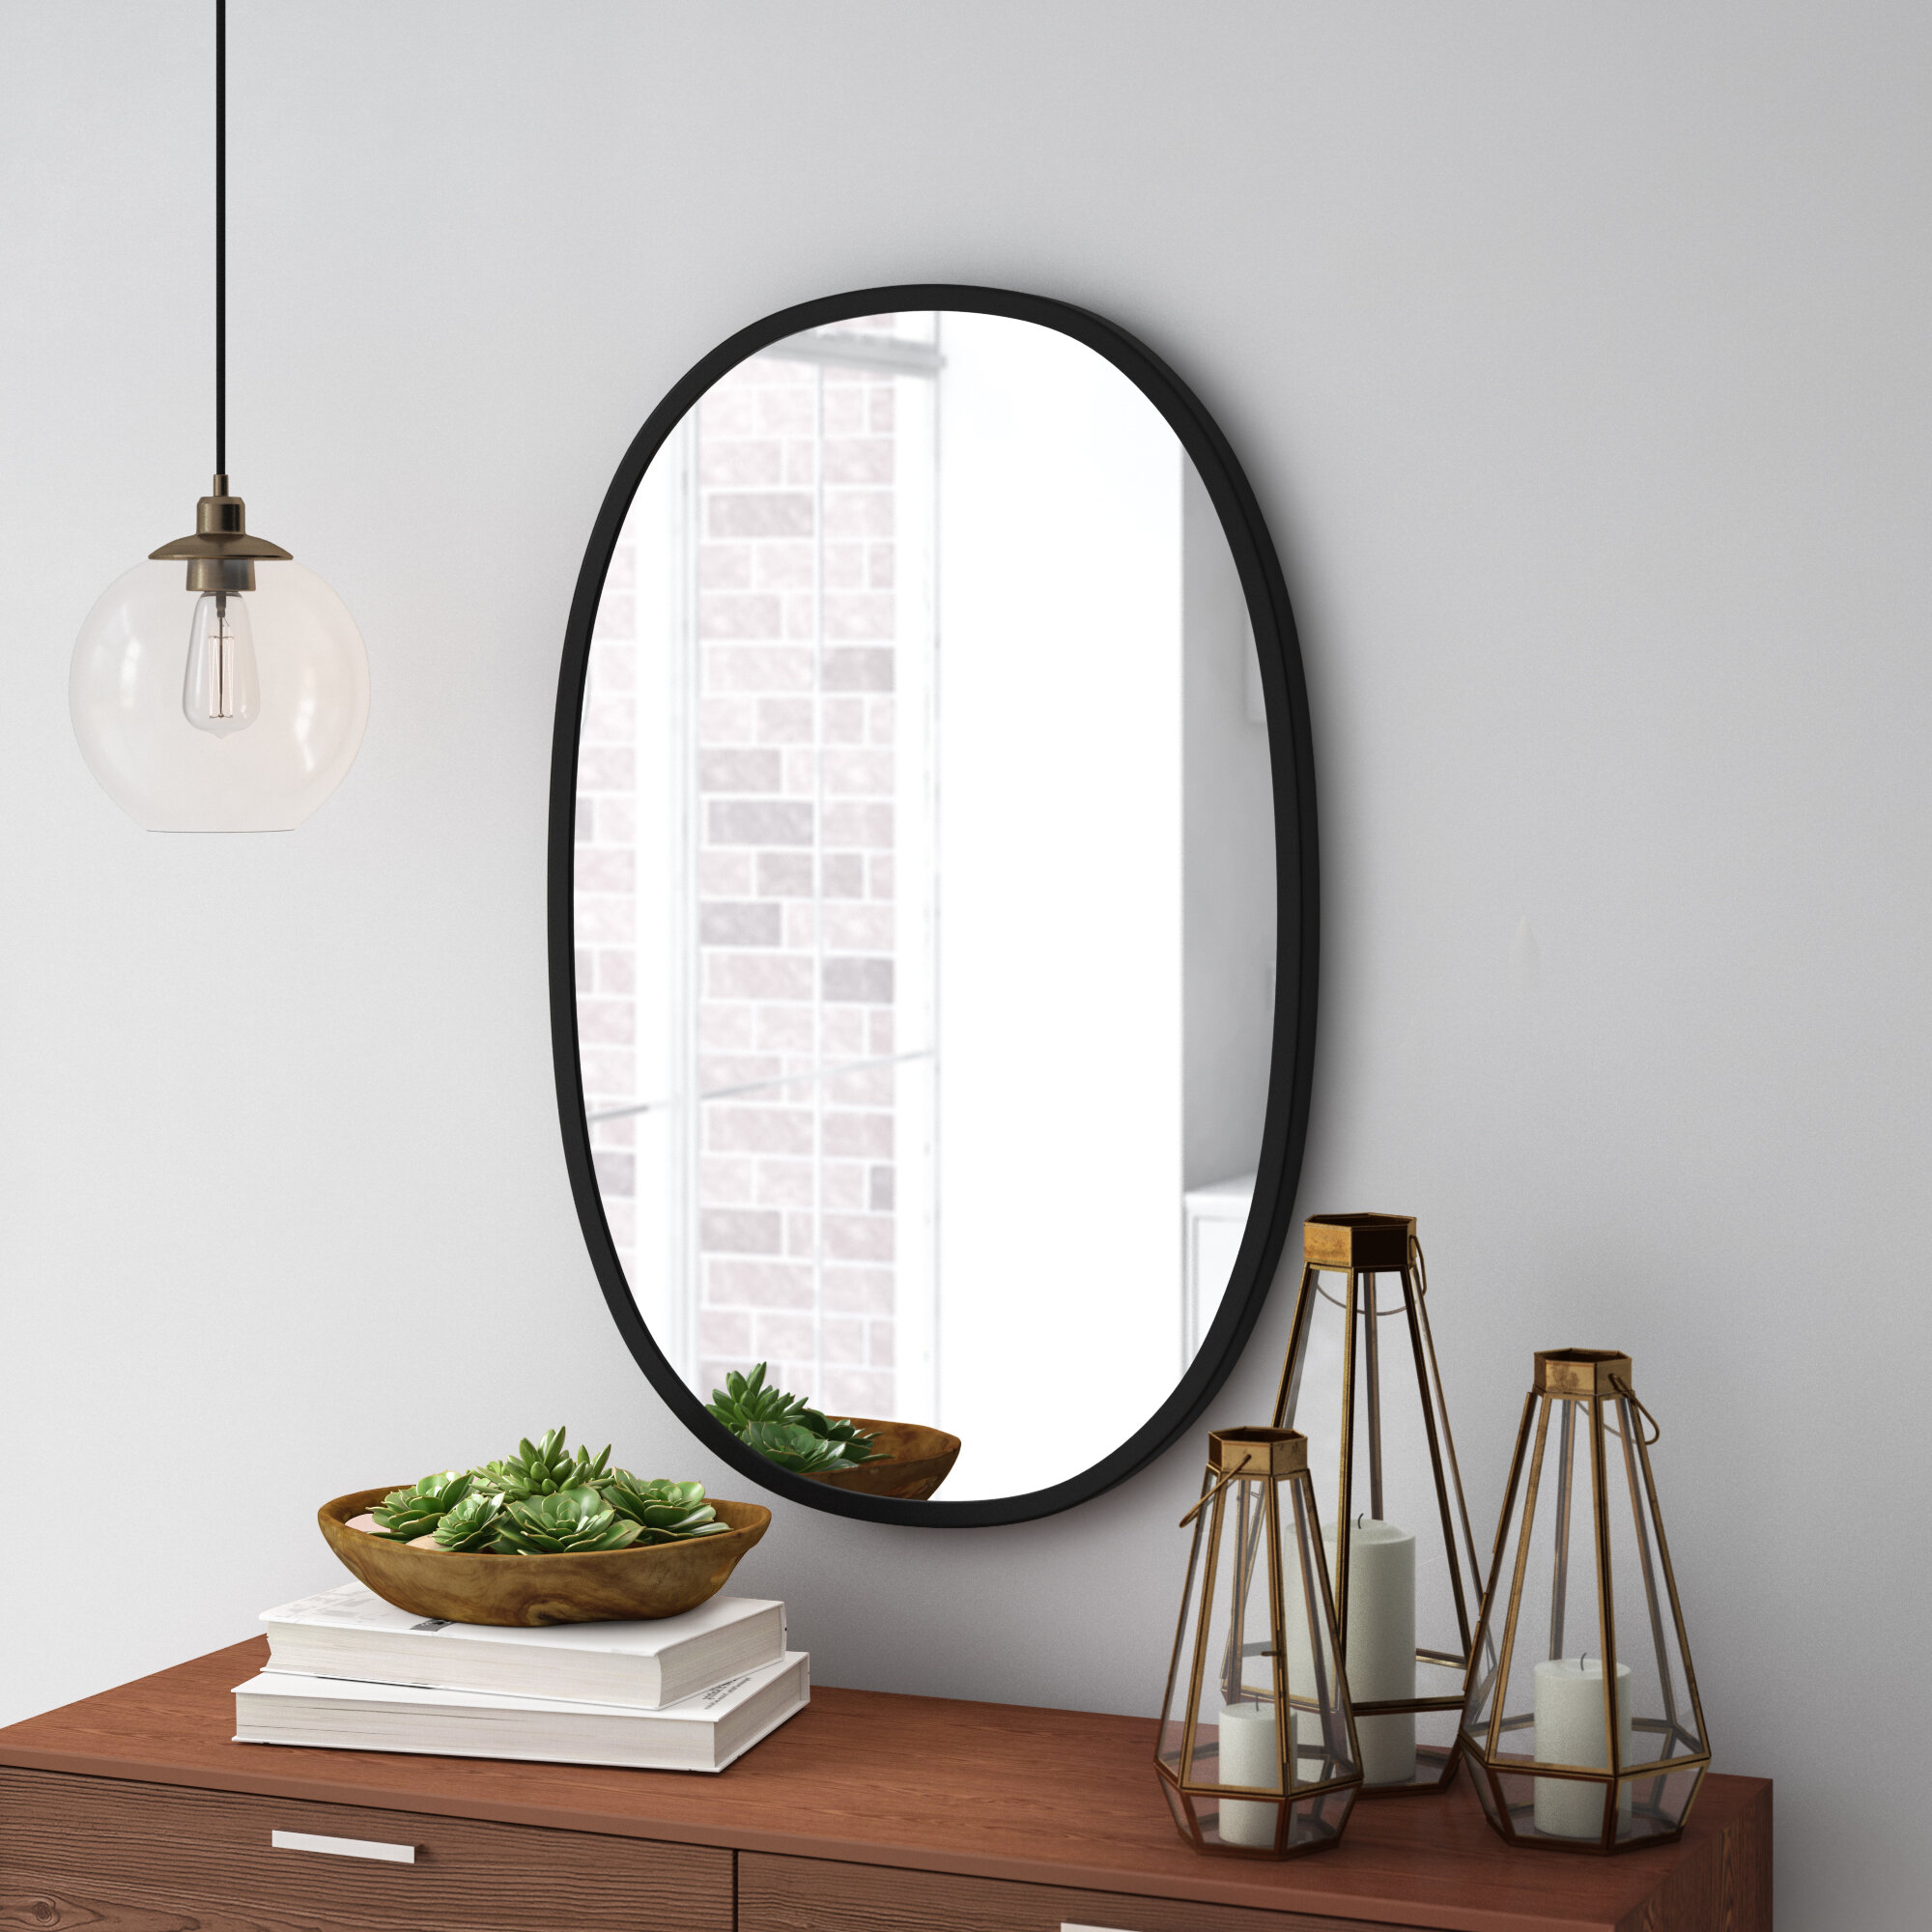 Umbra Hub Modern and Contemporary Accent Mirror & Reviews  Wayfair